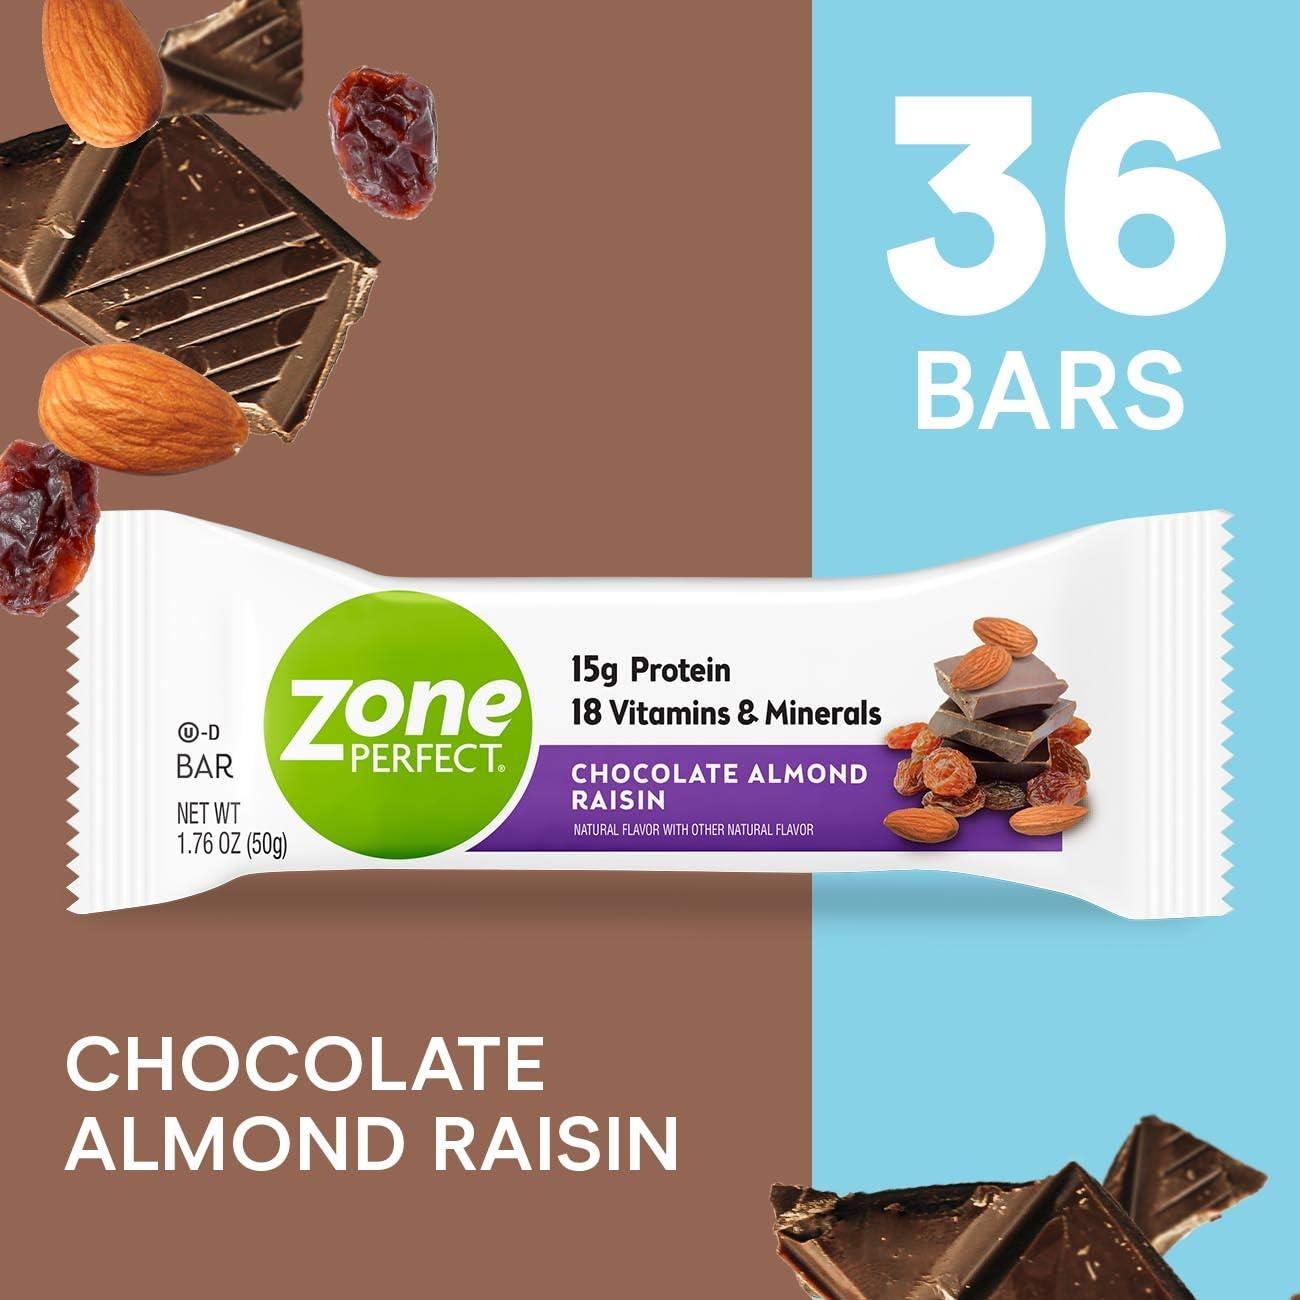 Rickaroons Coconut Energy Bars Mint to Be Vegan, Gluten Free, Organic, Paleo 1.6 Ounce 12 Count